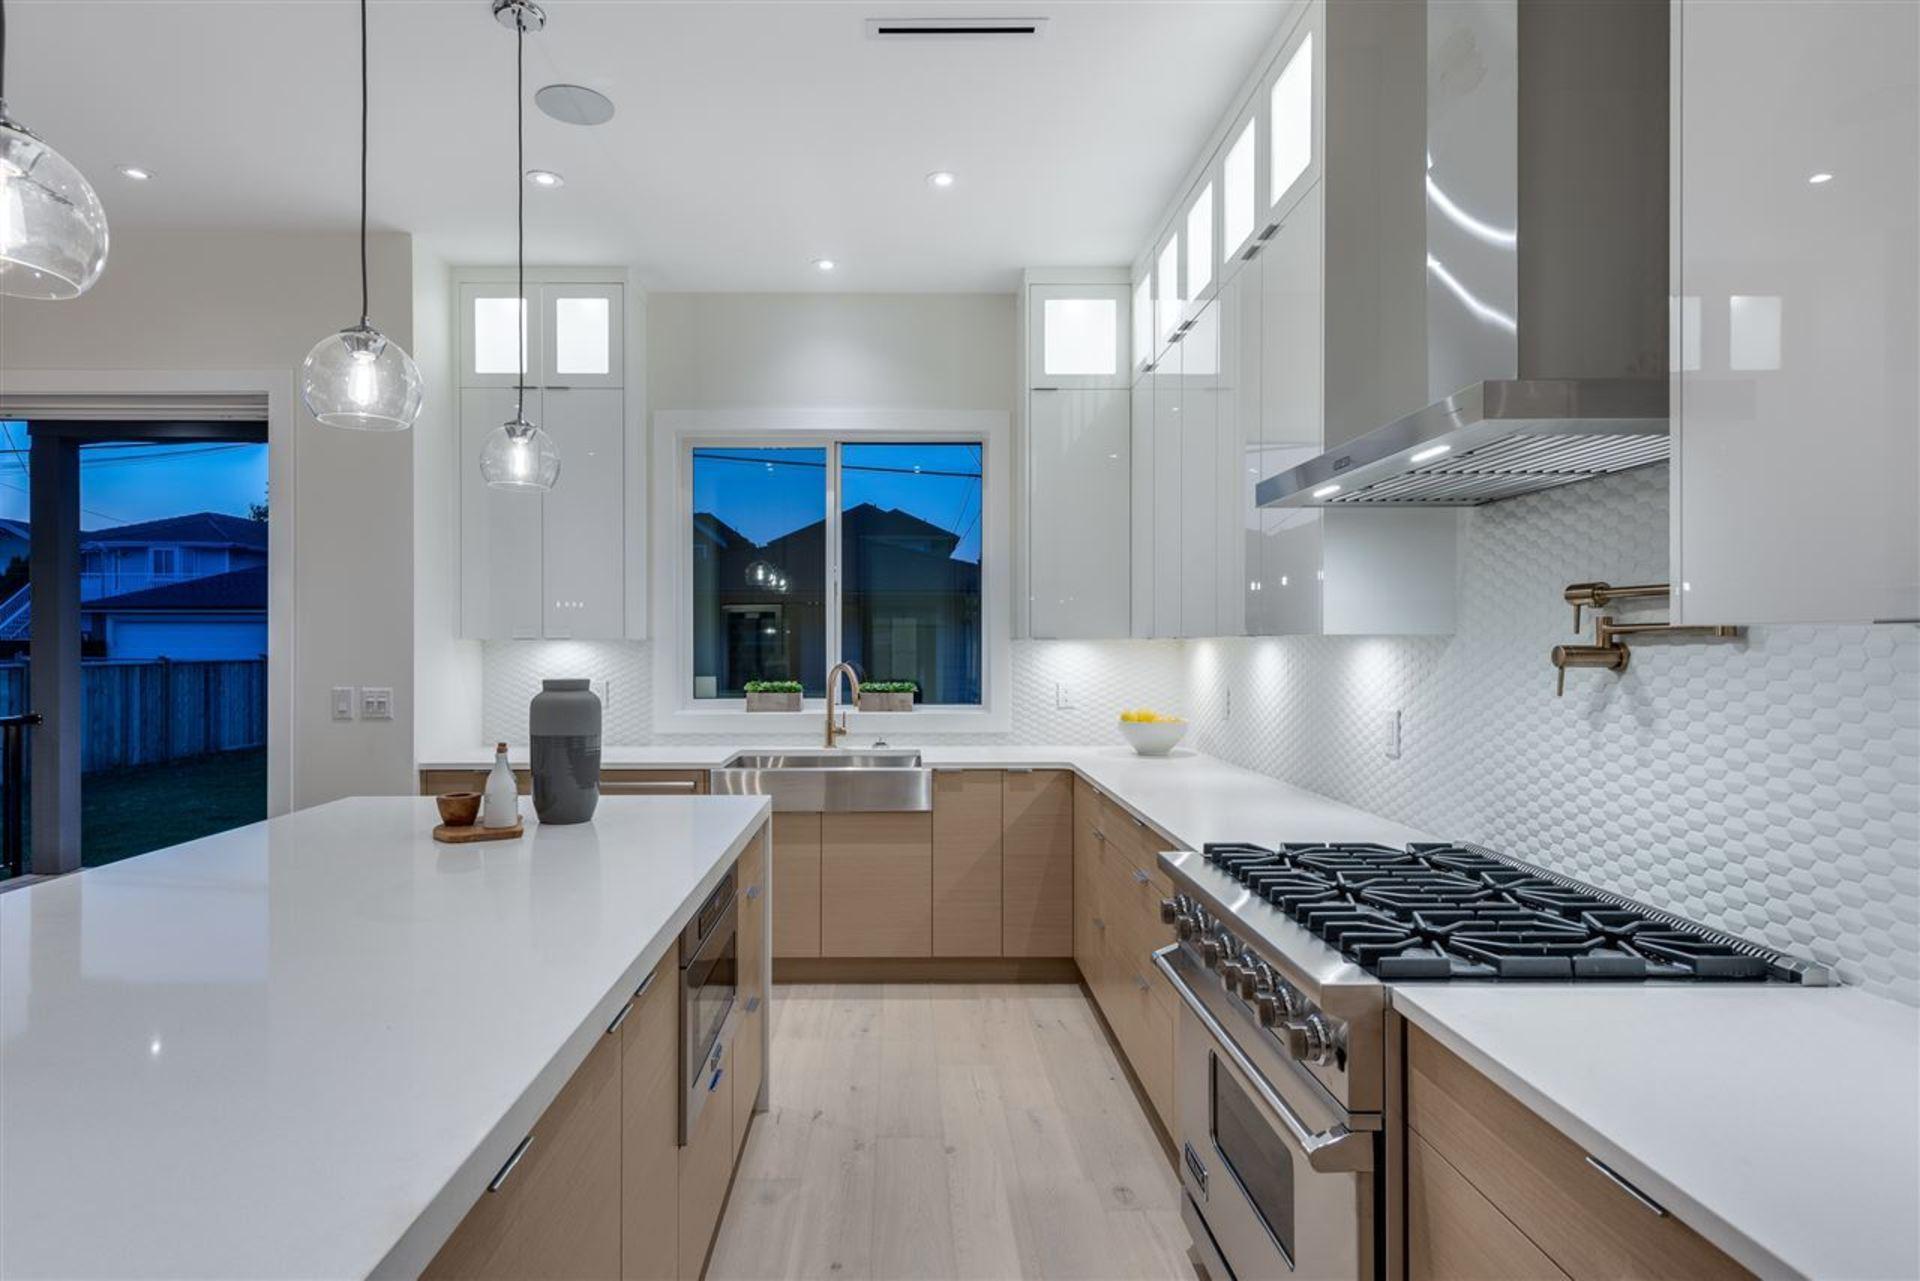 4165-pandora-street-vancouver-heights-burnaby-north-03 at